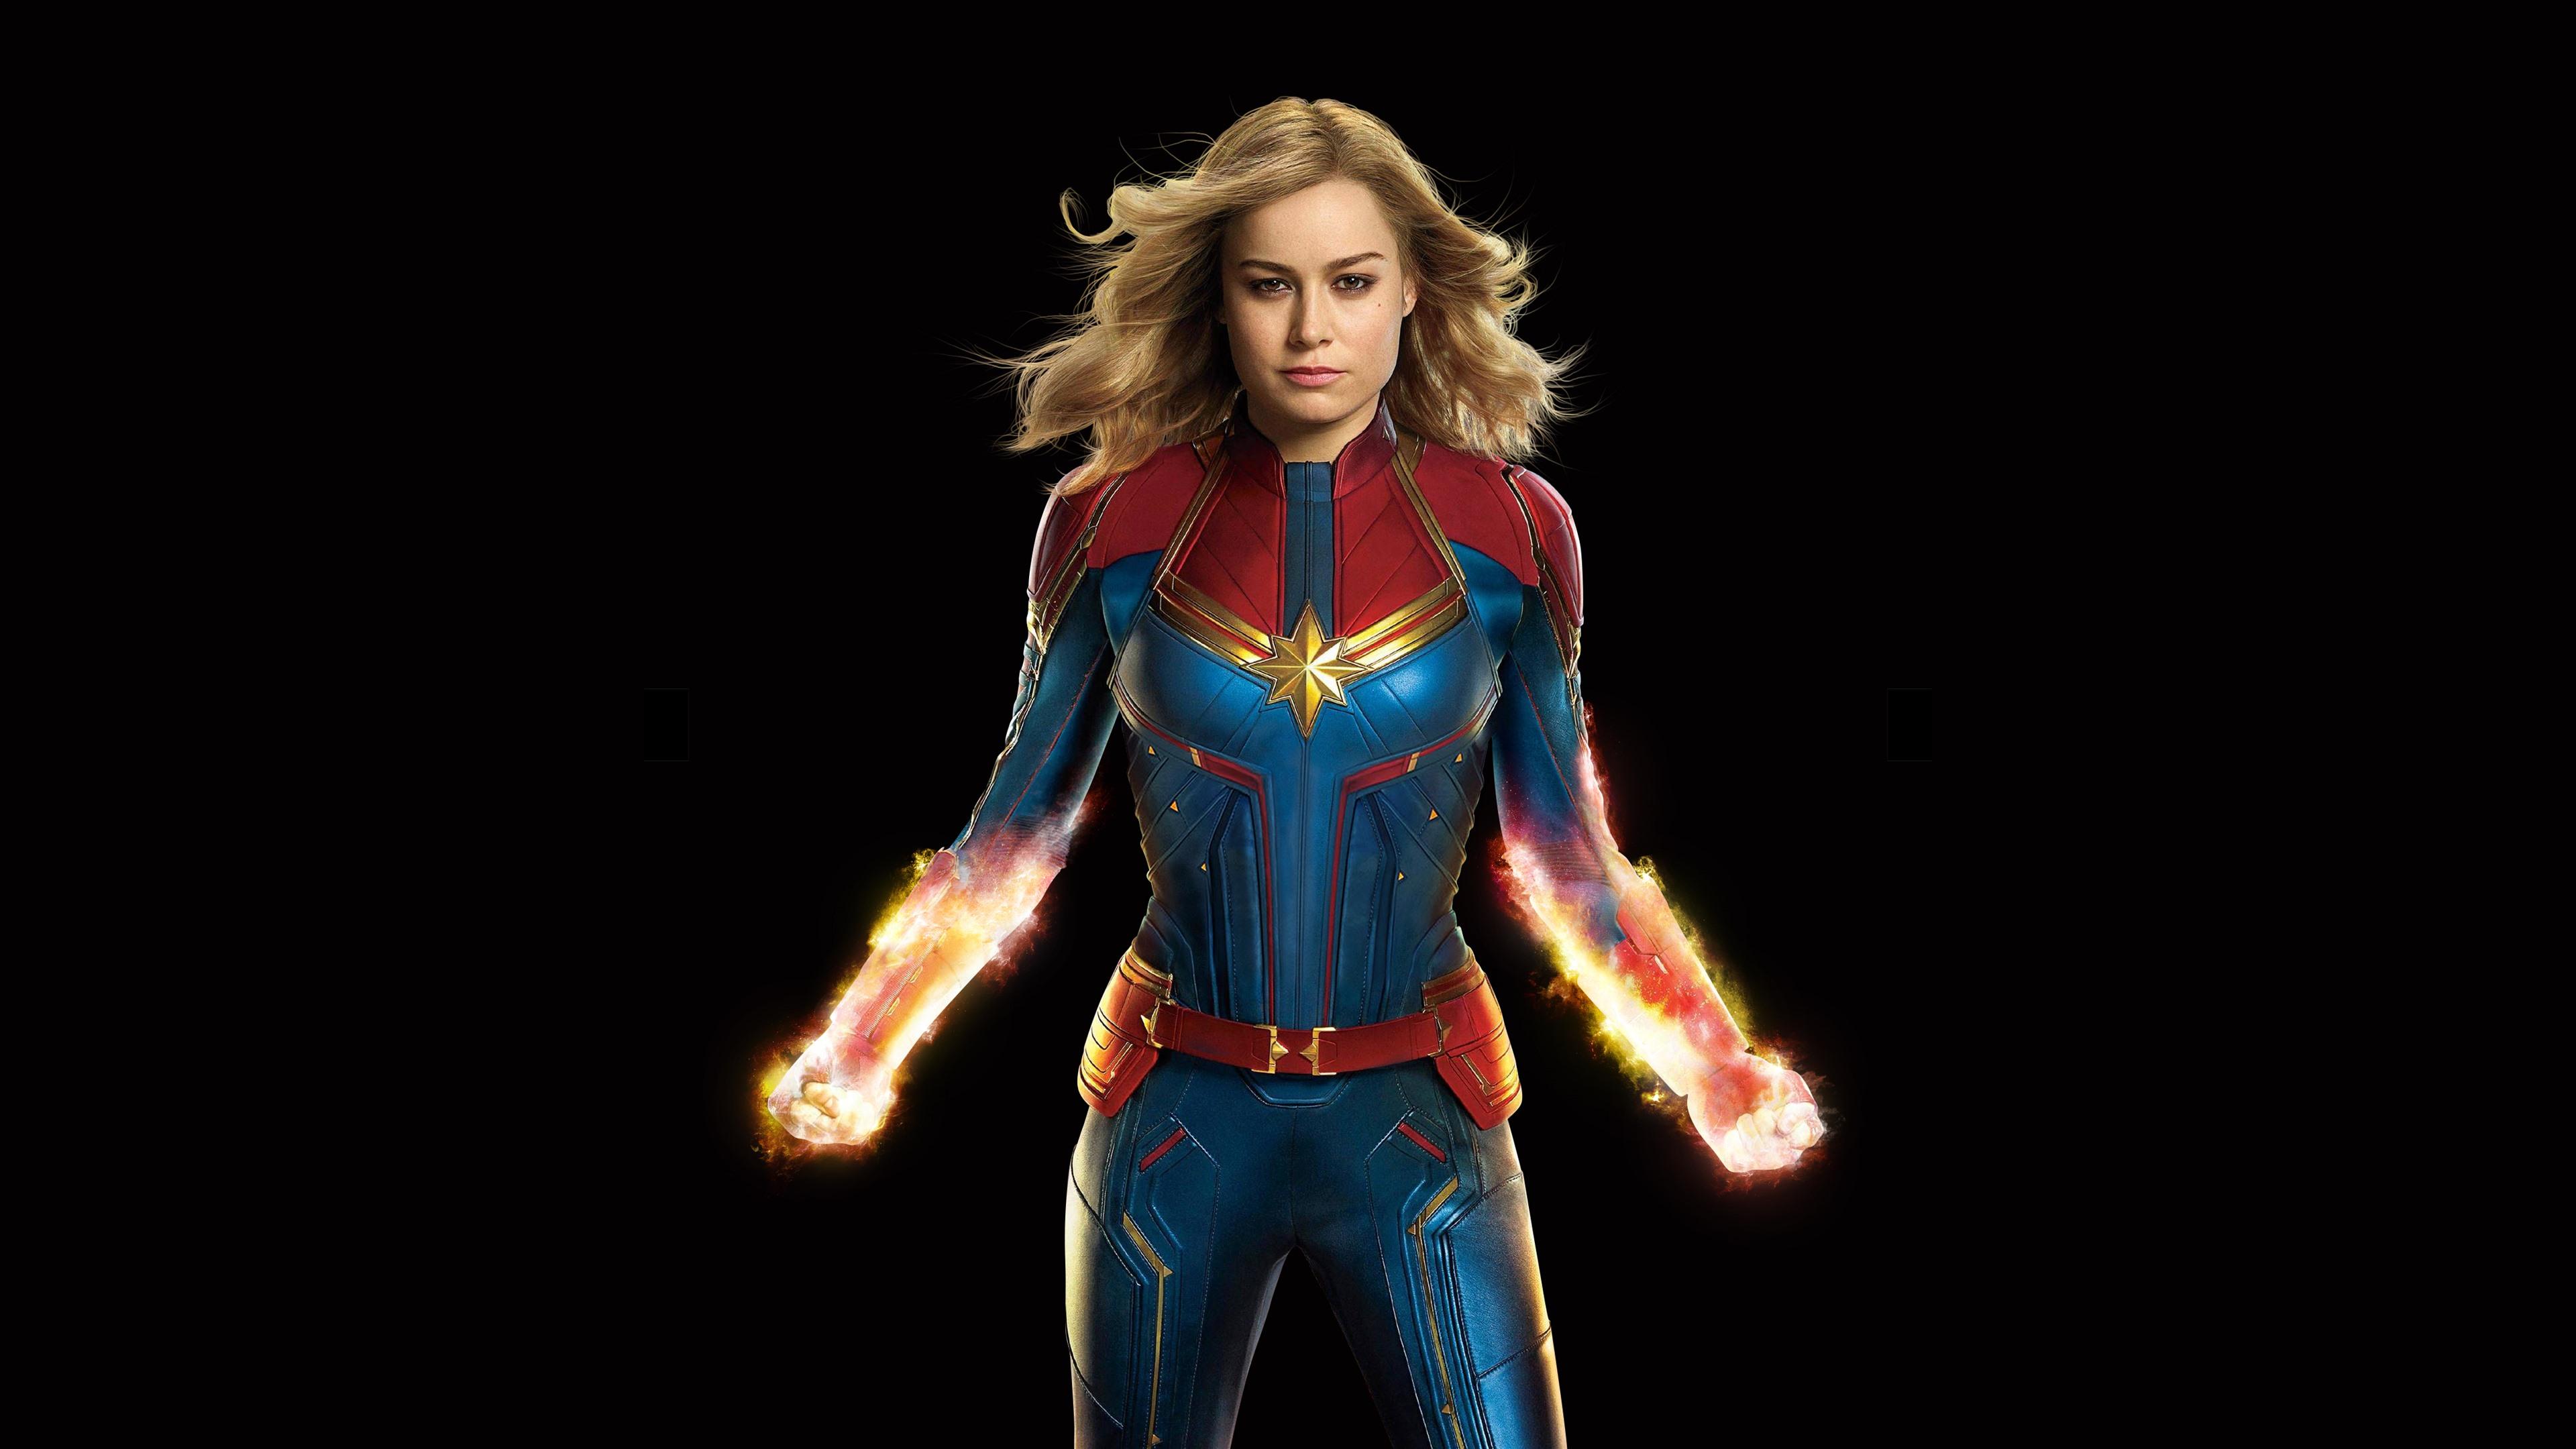 Wallpaper Captain Marvel Superhero Dc Comics 3840x2160 Uhd 4k